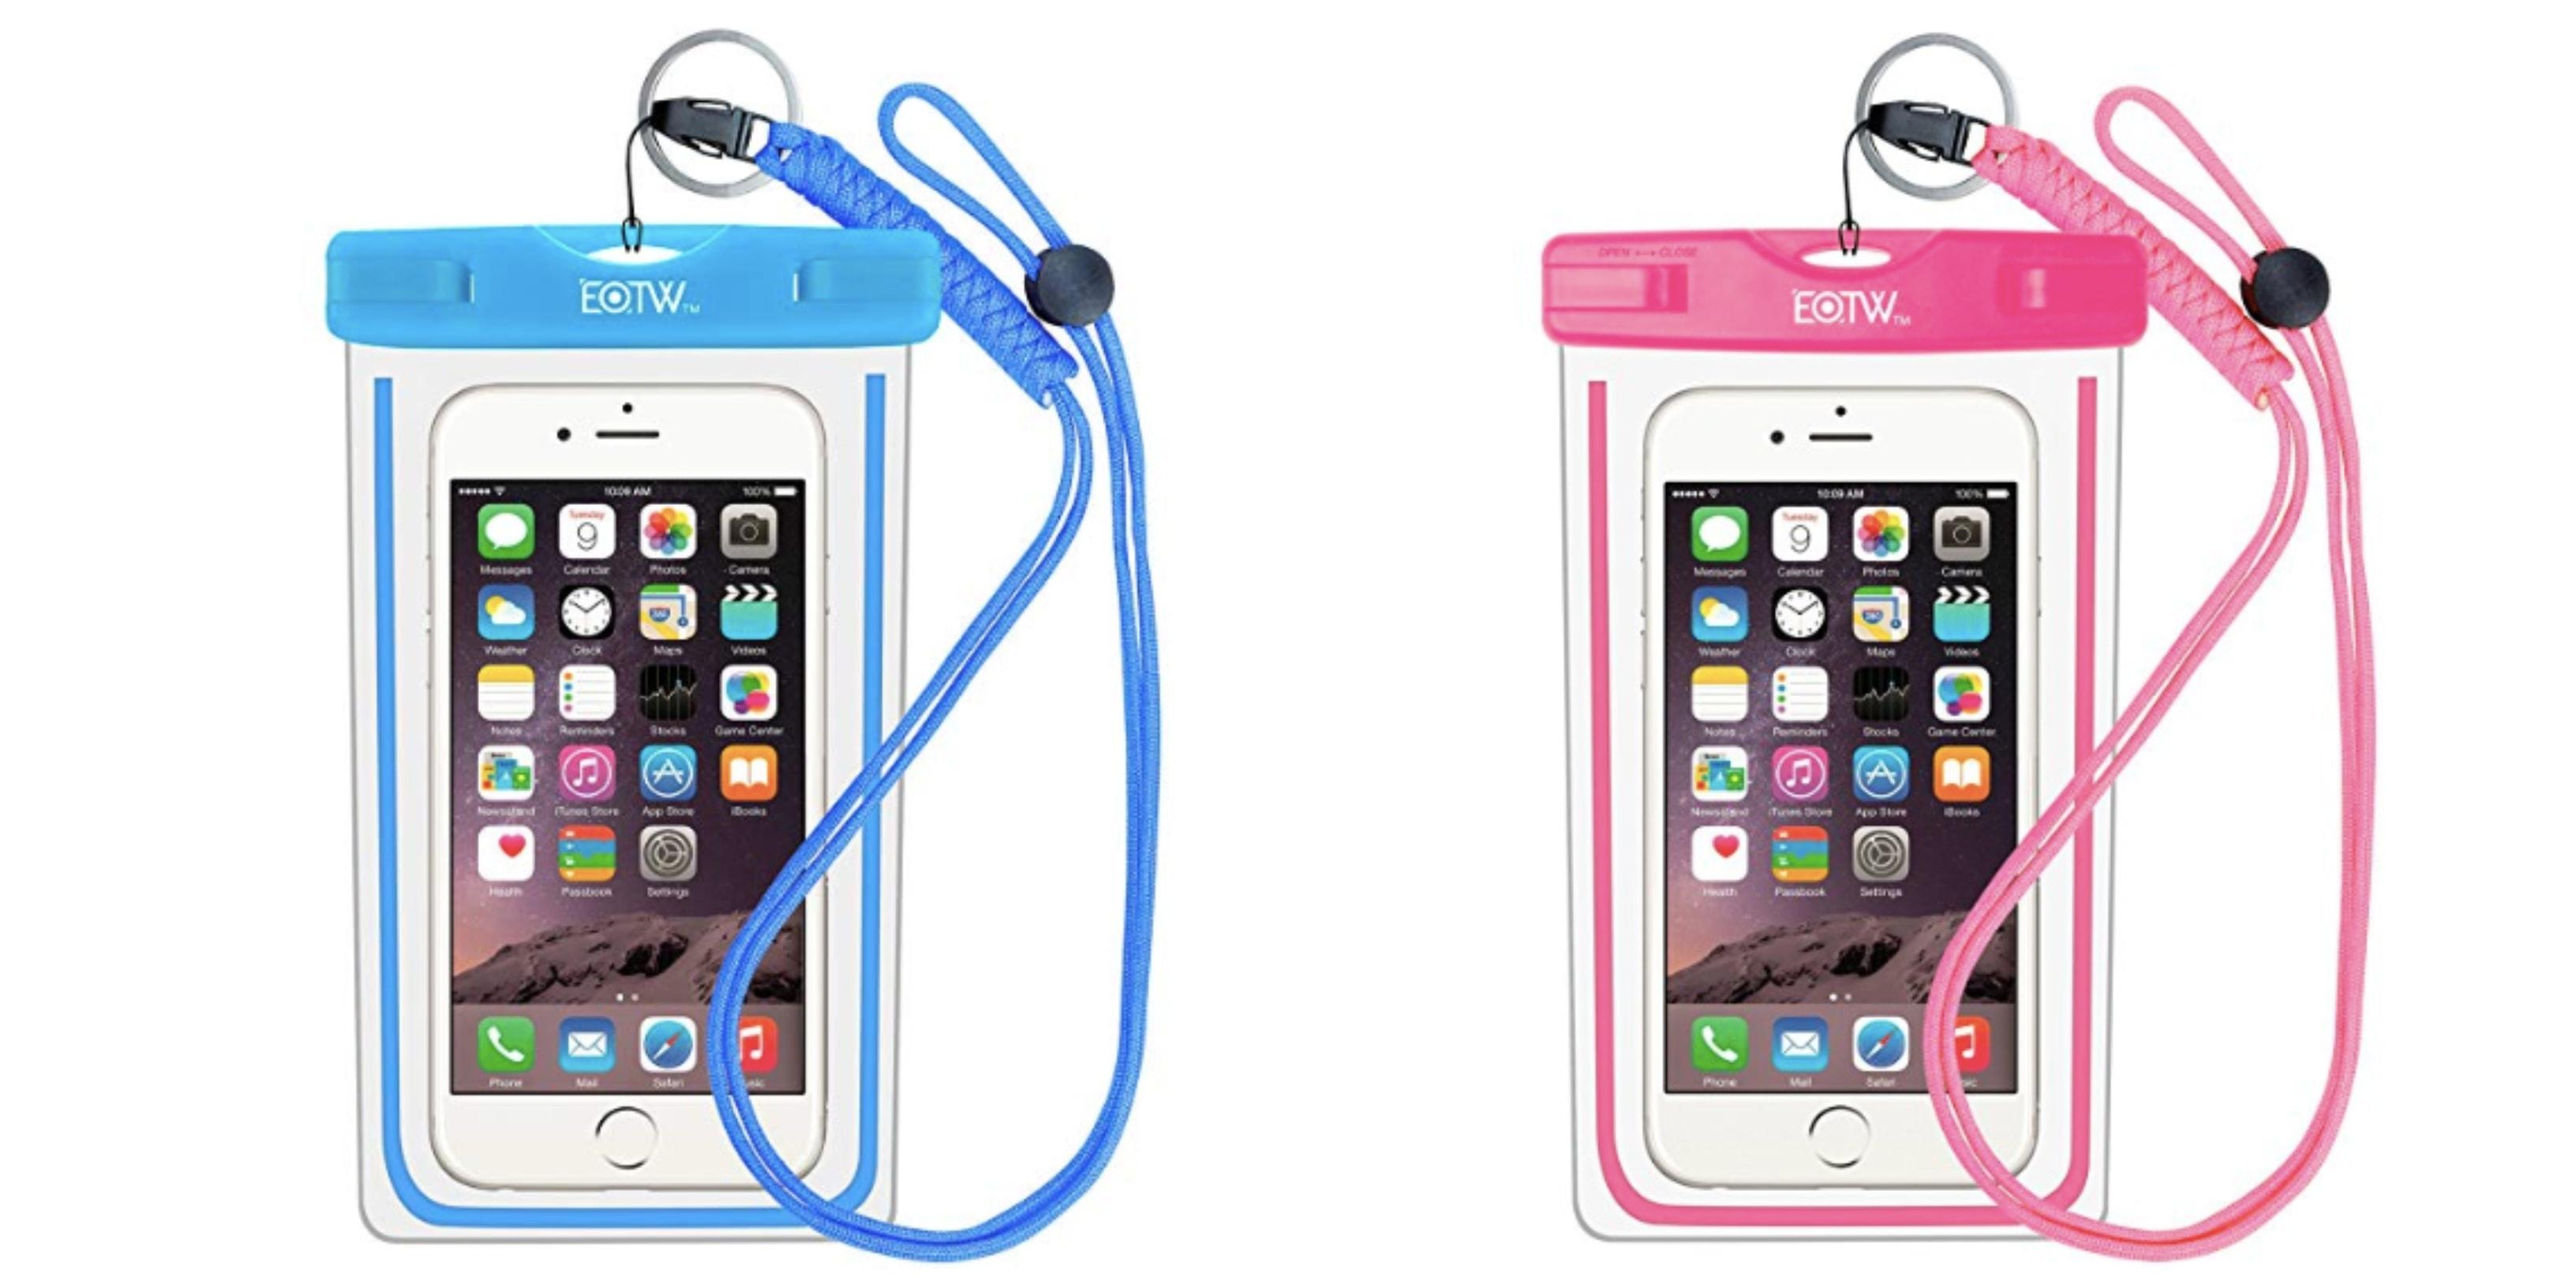 cruise gifts waterproof phone case